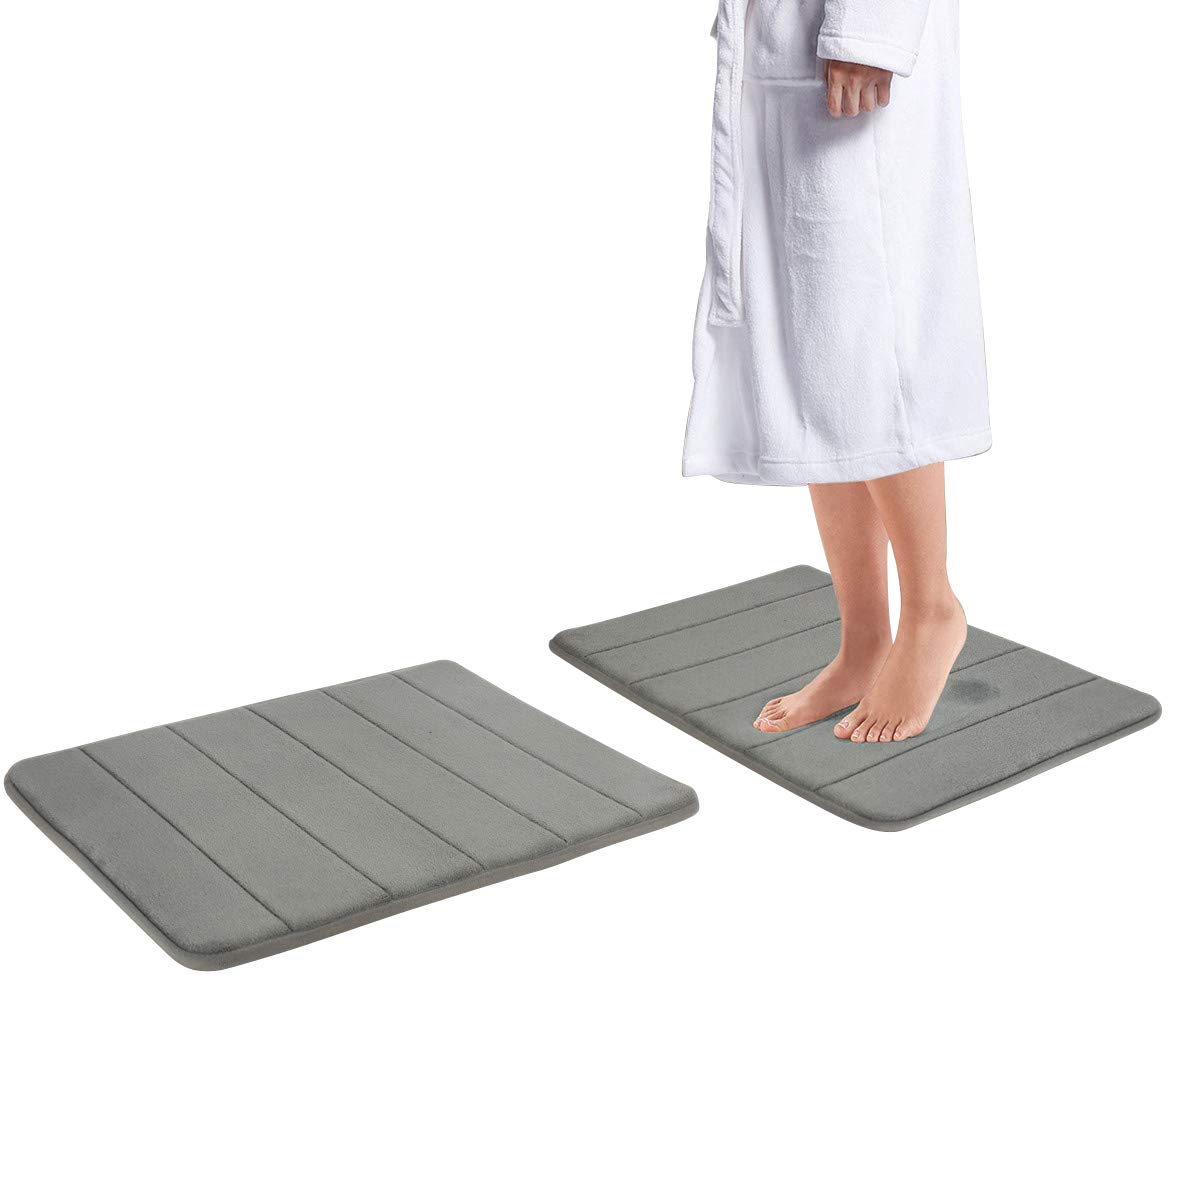 Drhob 2Pcs Gray 17''x 24'' Non Slip Coral Velvet Bathmat Absorbent Bath Rugs Memory Foam Bath Mats with Anti-Skid Bottom